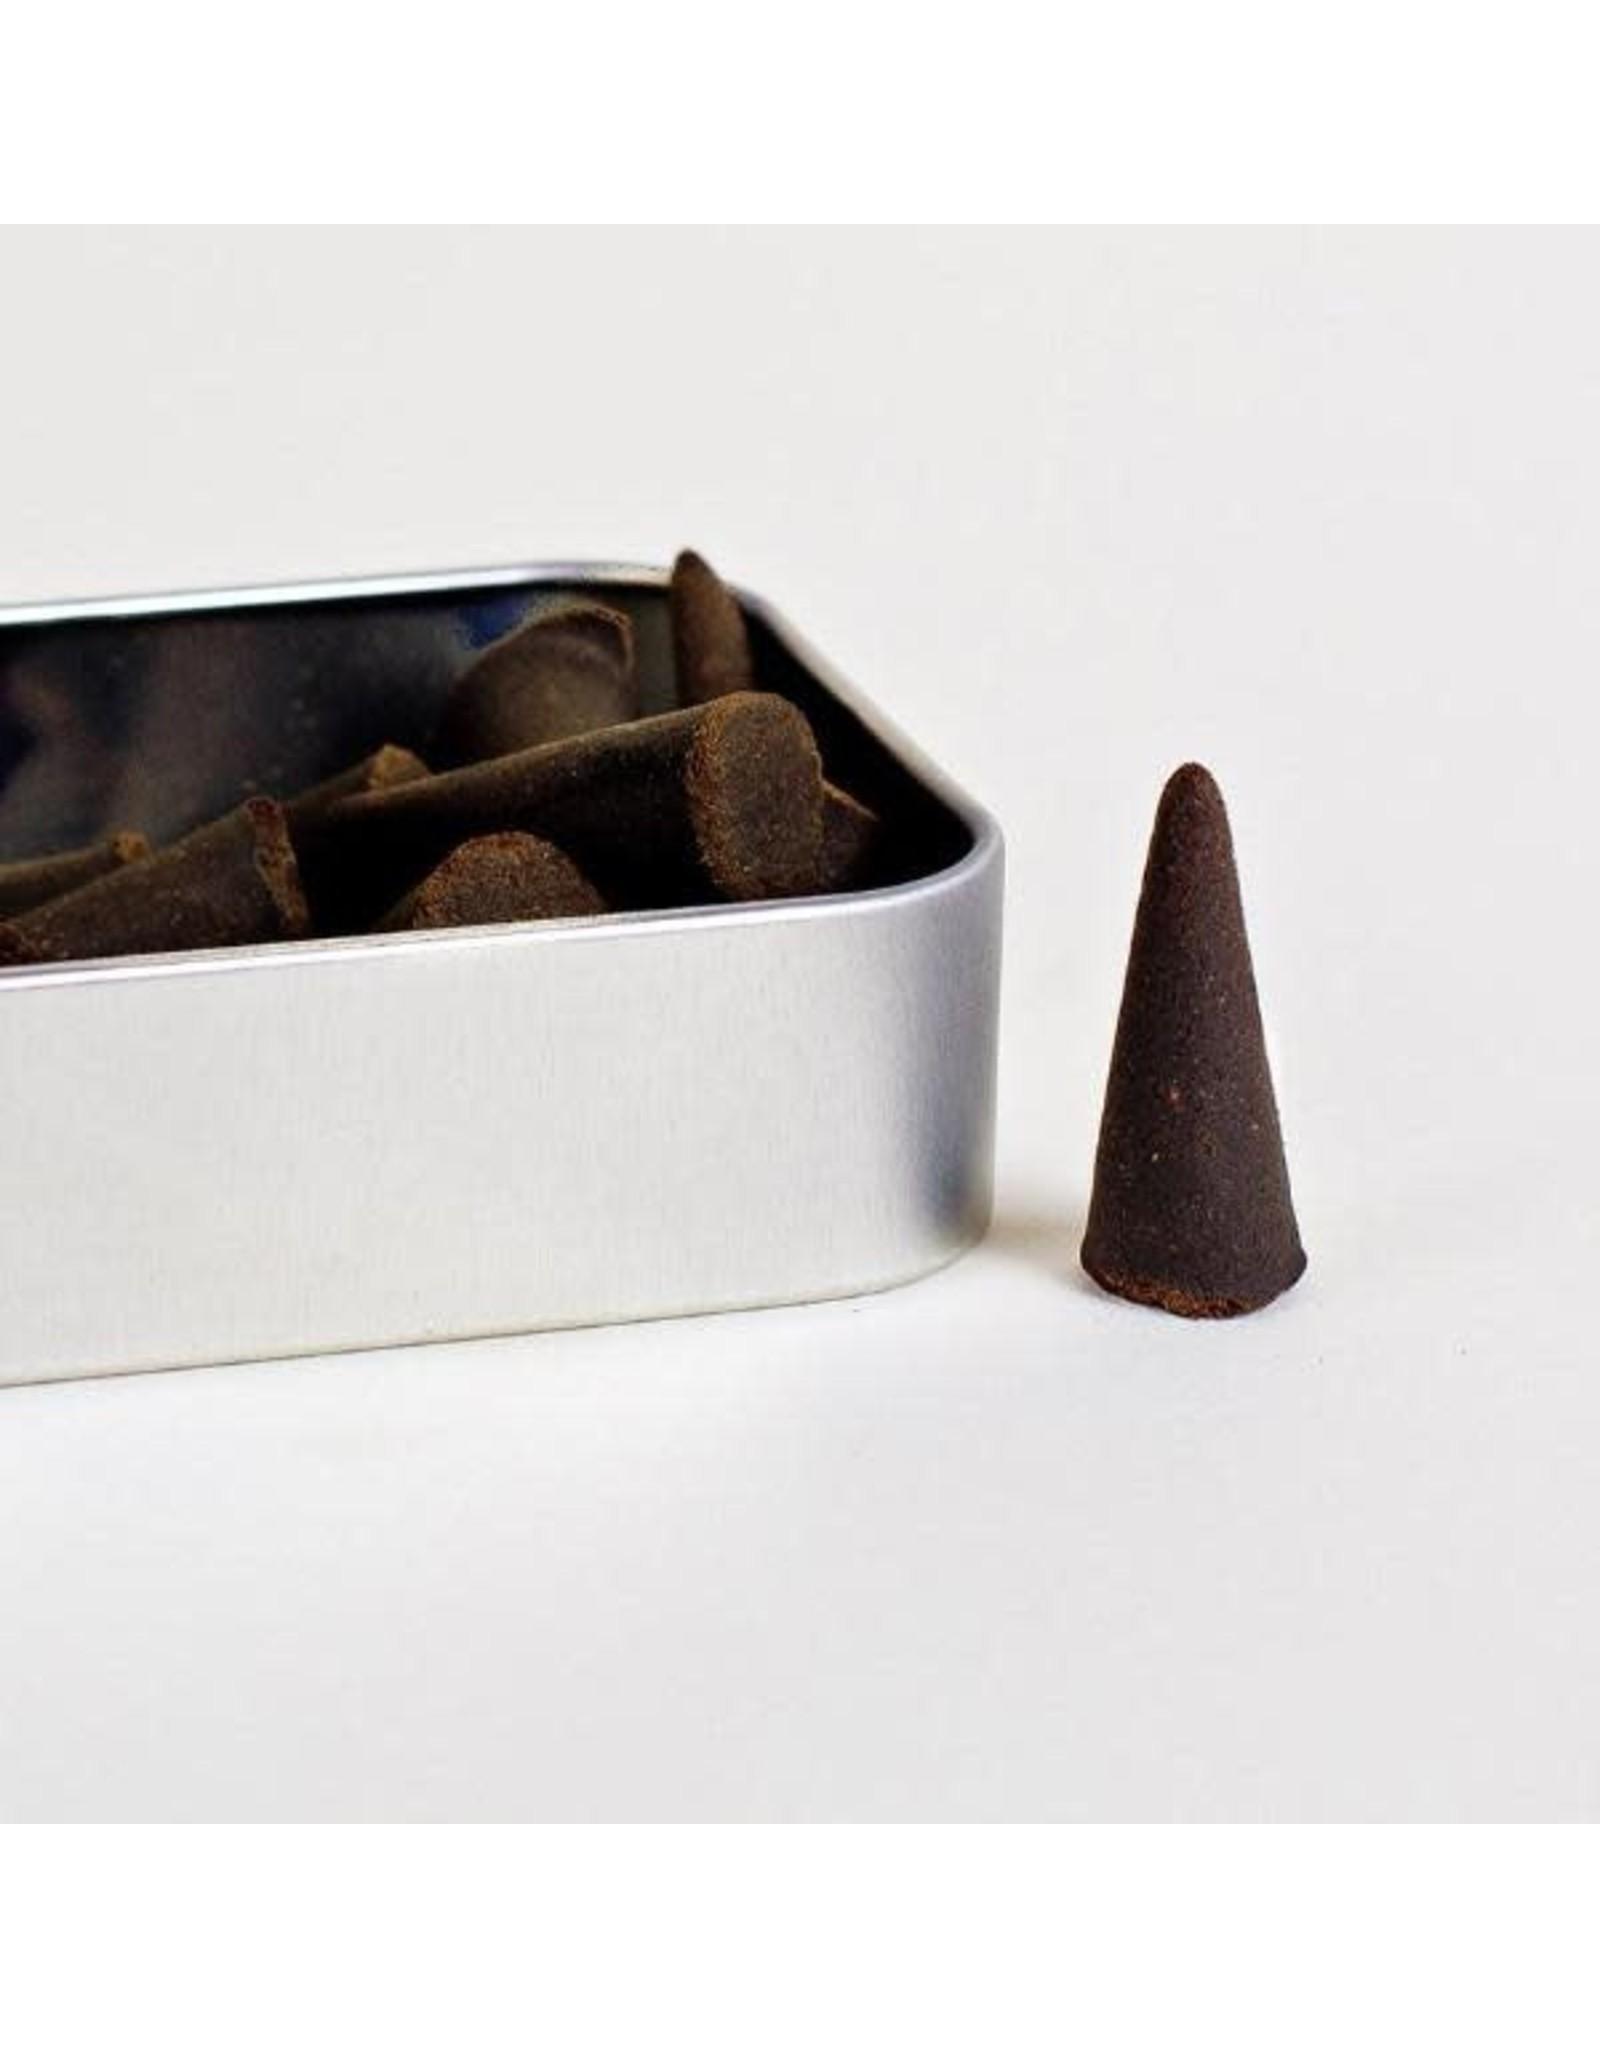 Good & Well Supply Co. Theodore Roosevelt Cone Incense - Tobacco Leaf, Cedar + Honey